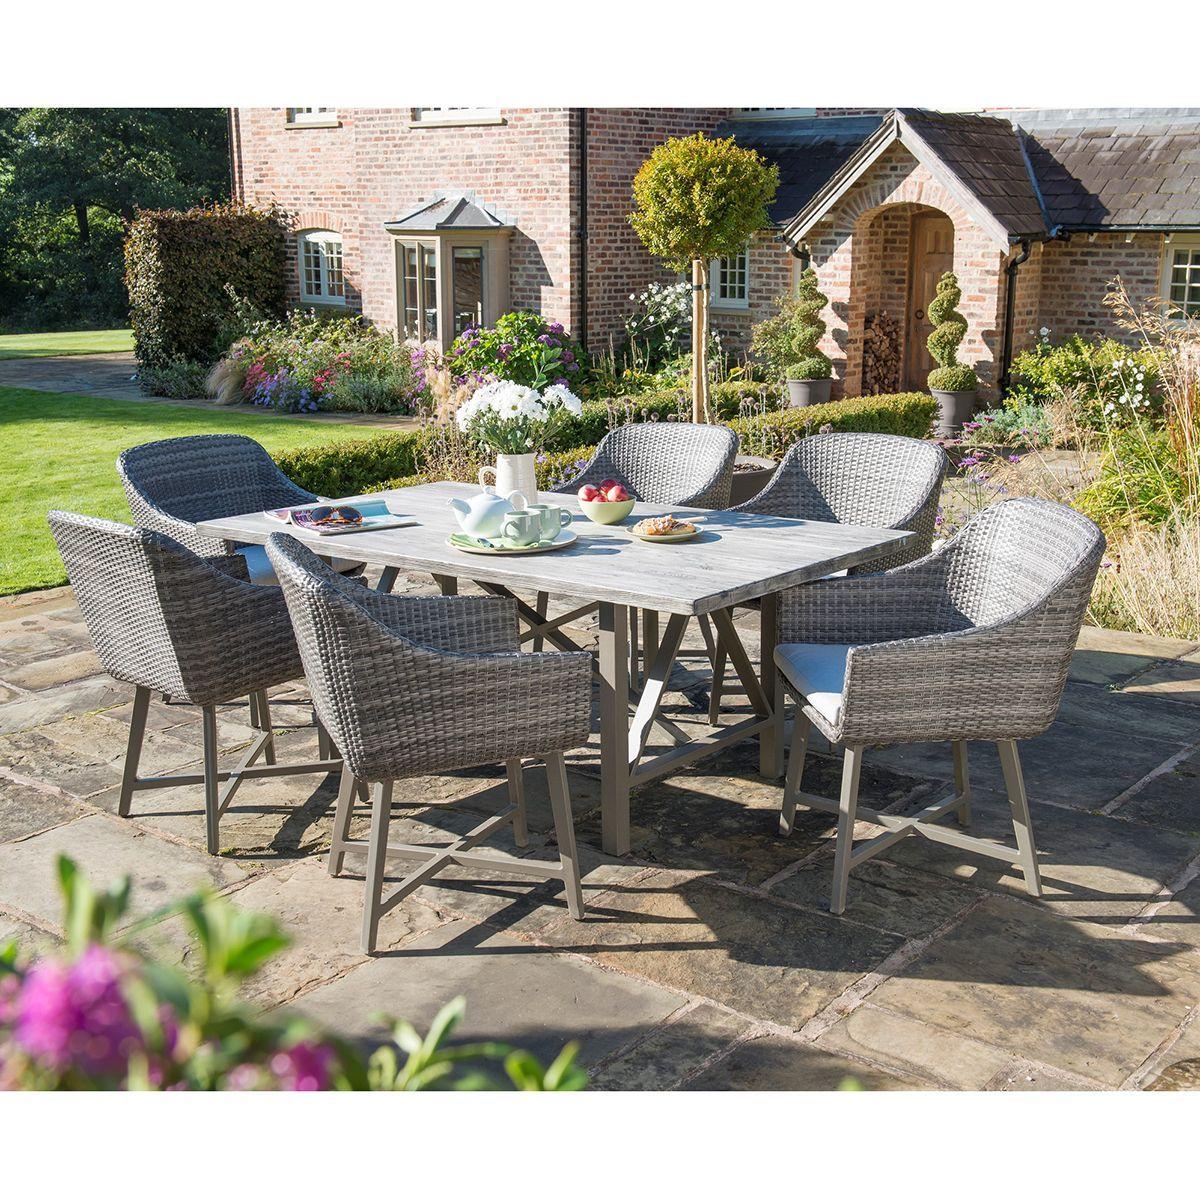 kettler siena 6 seat set ksieset03 garden furniture world garden furniture pinterest gardens furniture and siena